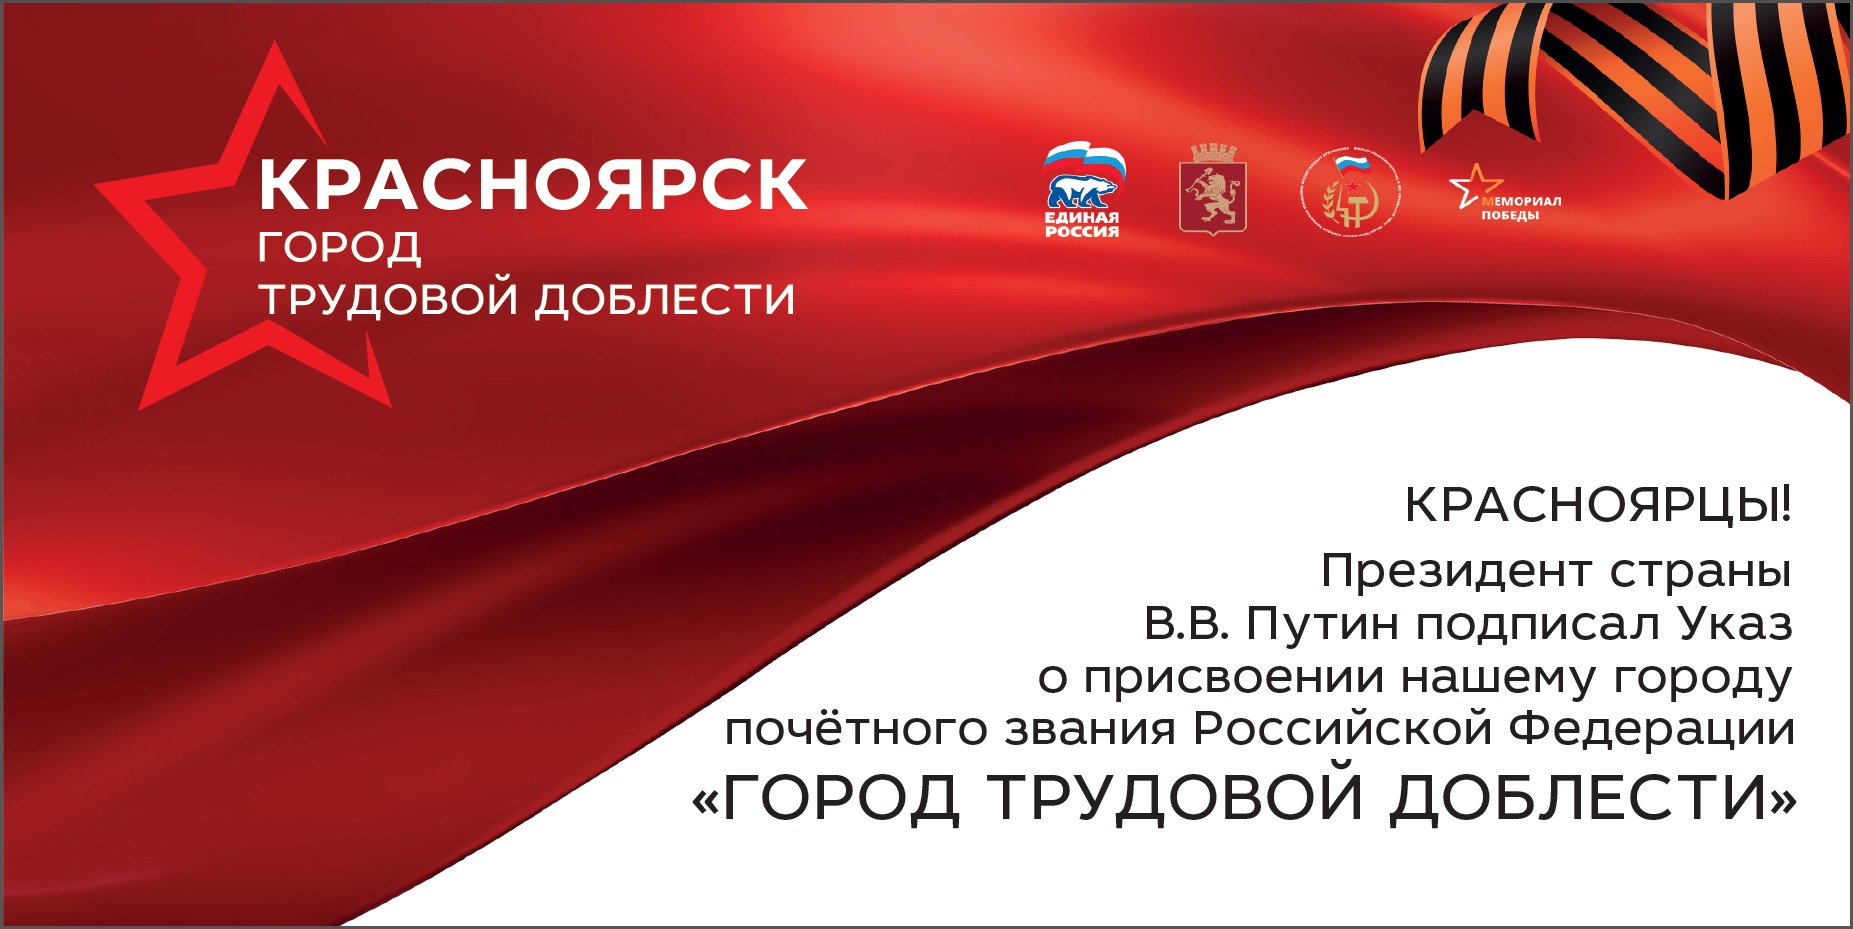 Gorod trudovoj doblesti 2 - Красноярск - город Трудовой Доблести